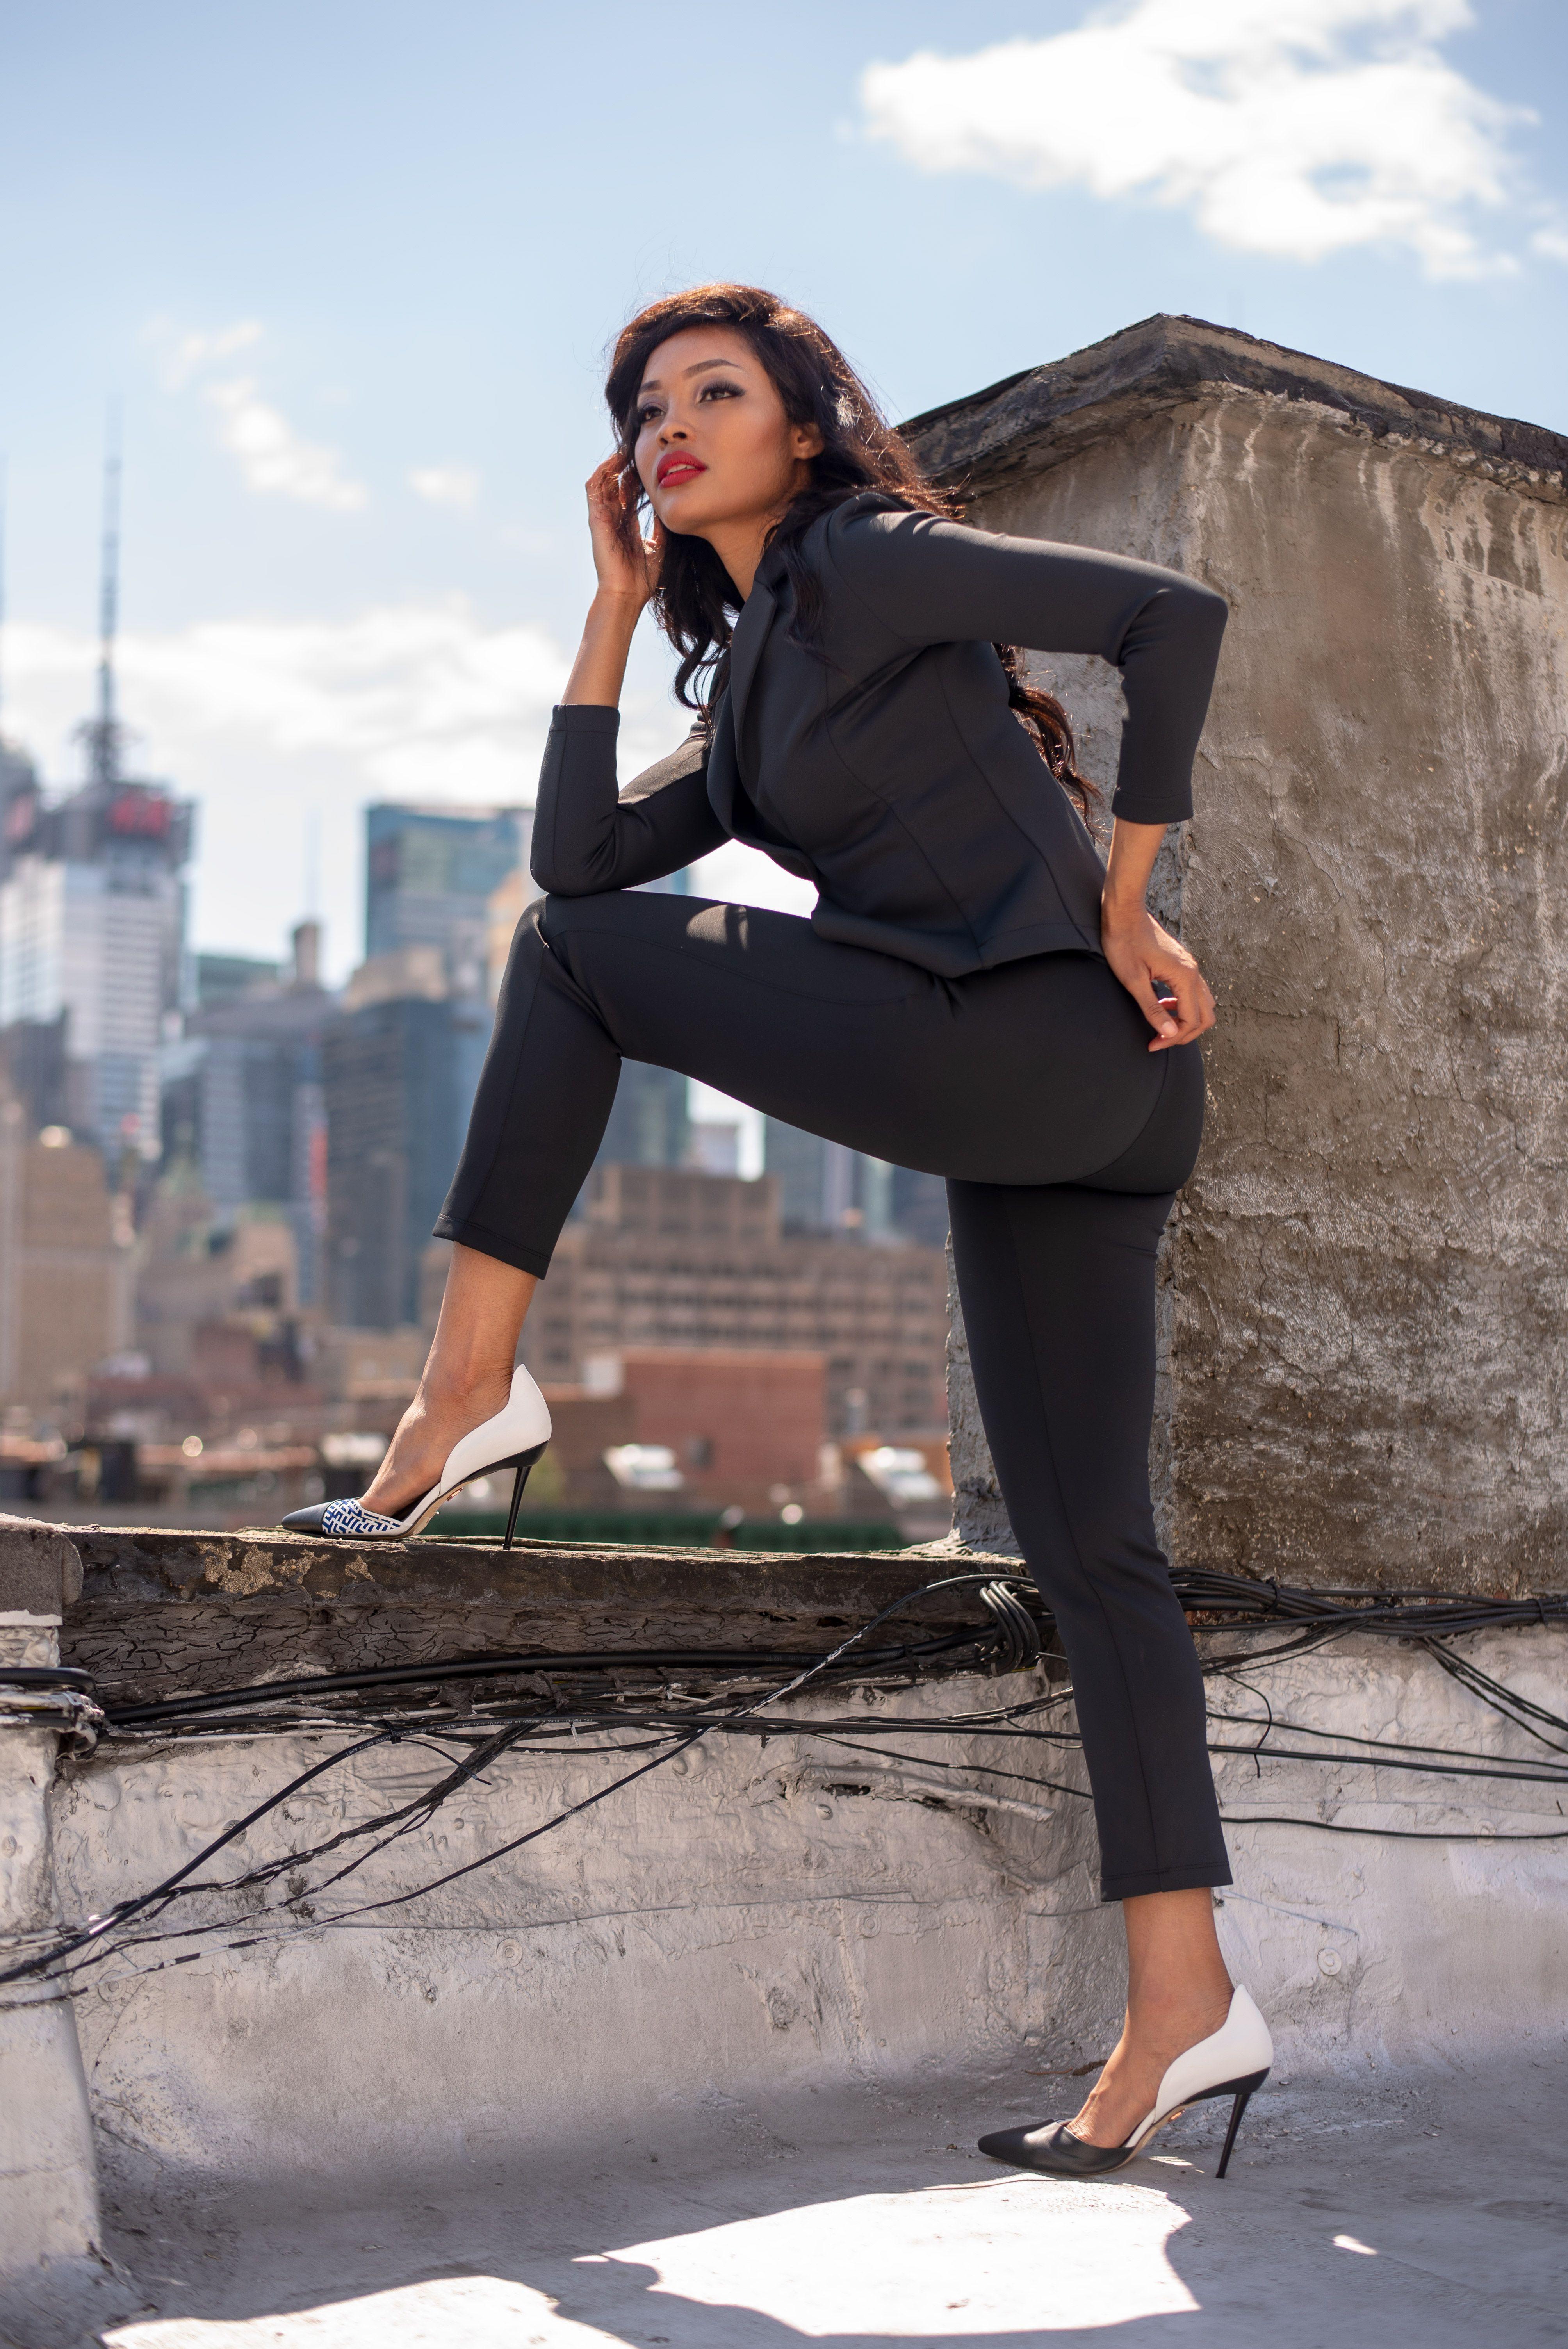 15ea4cf80fe639 #shoes #stiletto #flats #fashion #fashionaddict #iloveshoes #shoefie  #outfit #shoeaholic #shoenvy #shoegram #ootd #trendy #highheels #heels